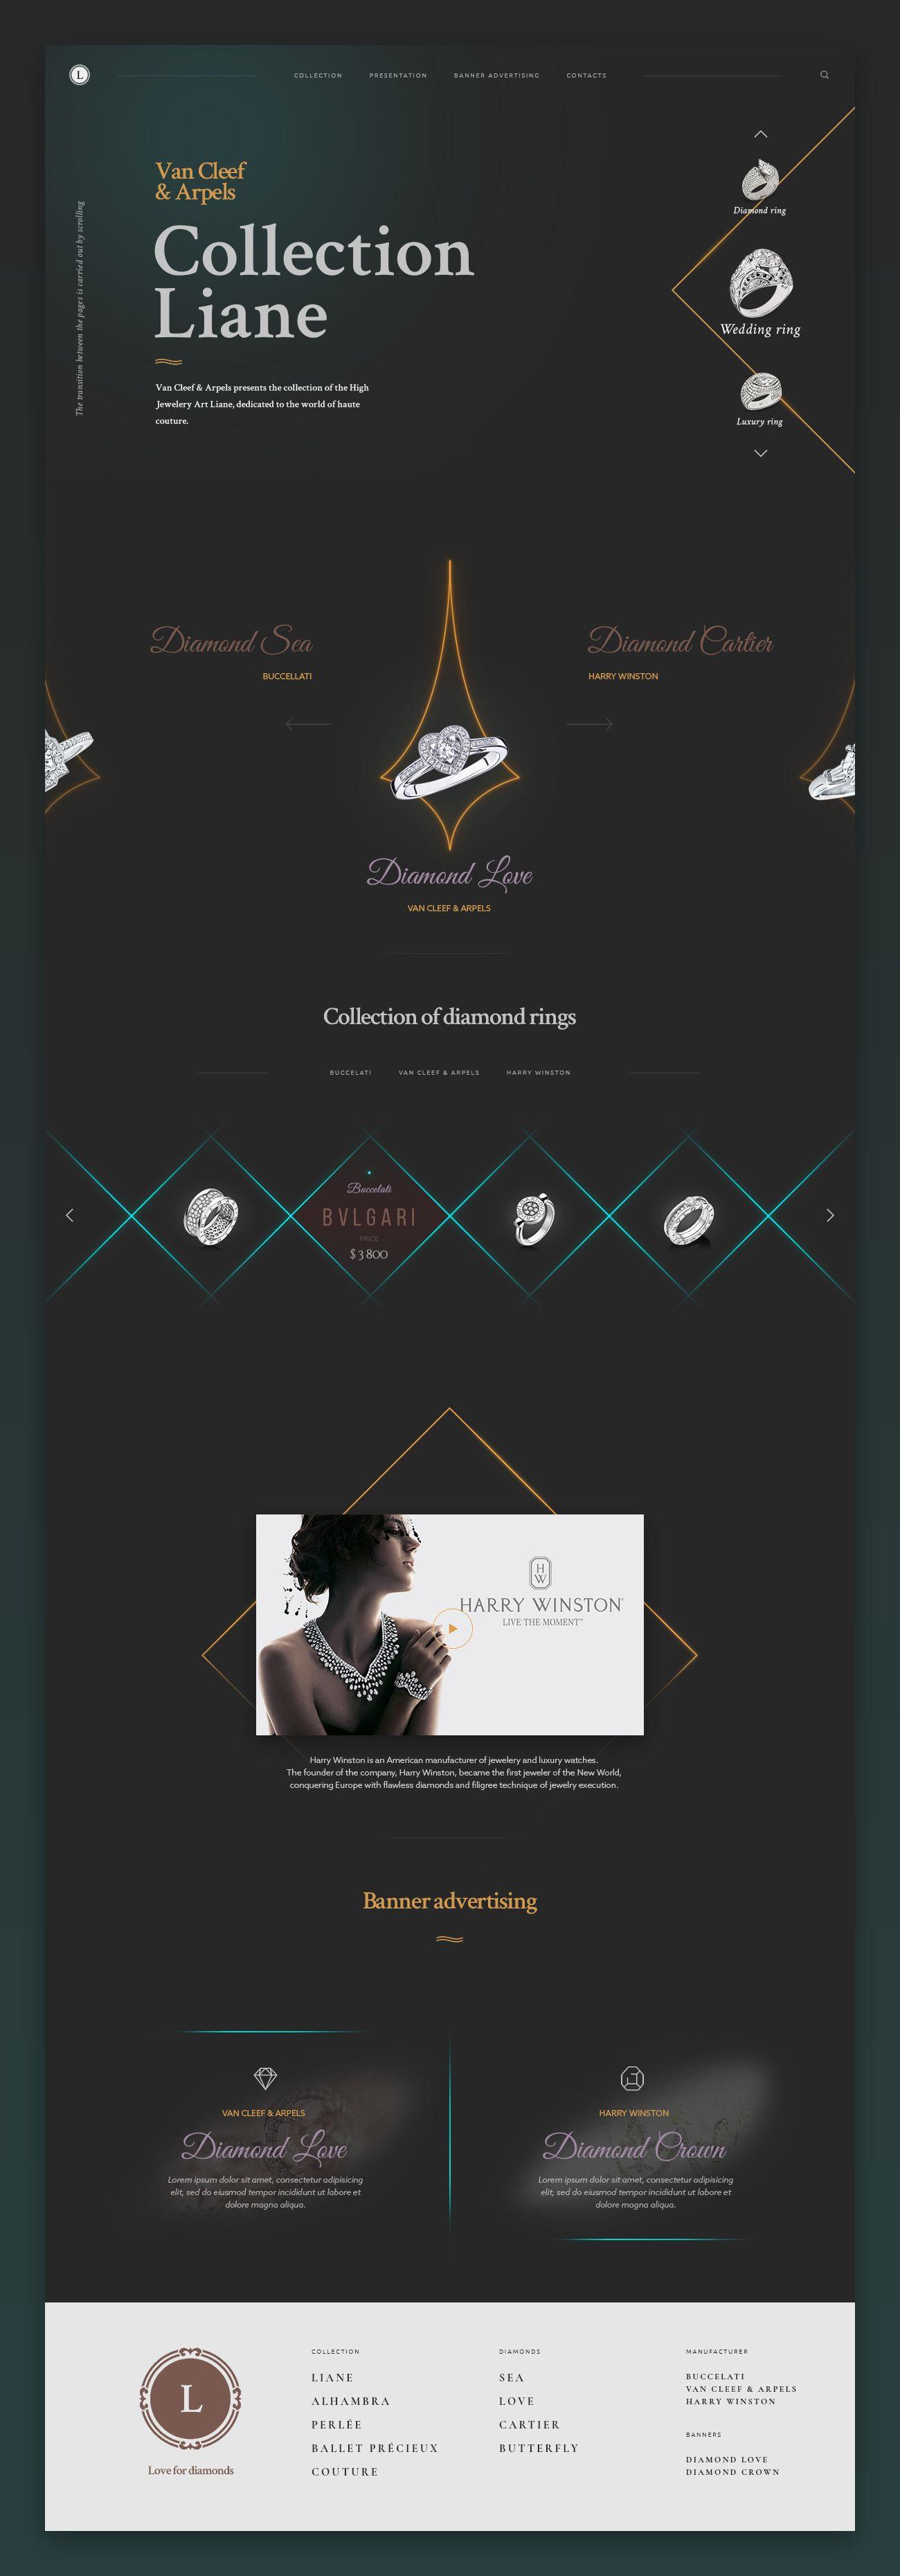 Website Design Love For Diamonds Websites Pinterest Website